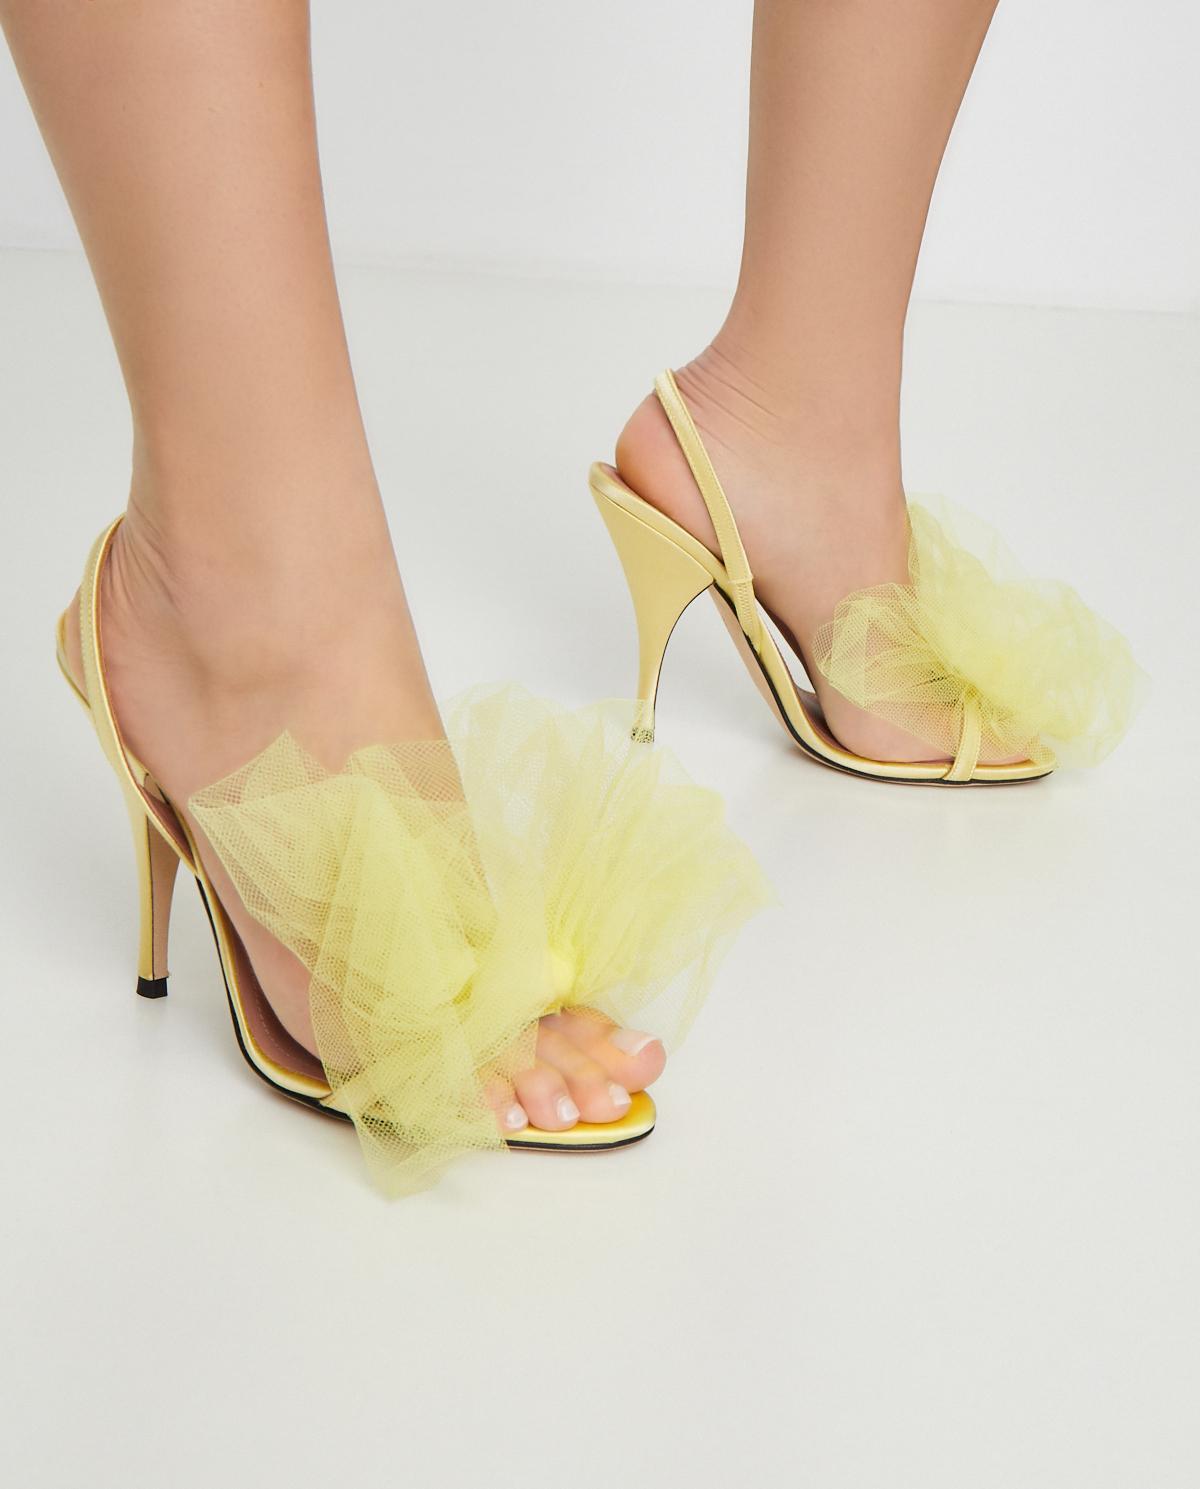 Żółte sandały z kokardą Marco de Vincenzo MXV347 028